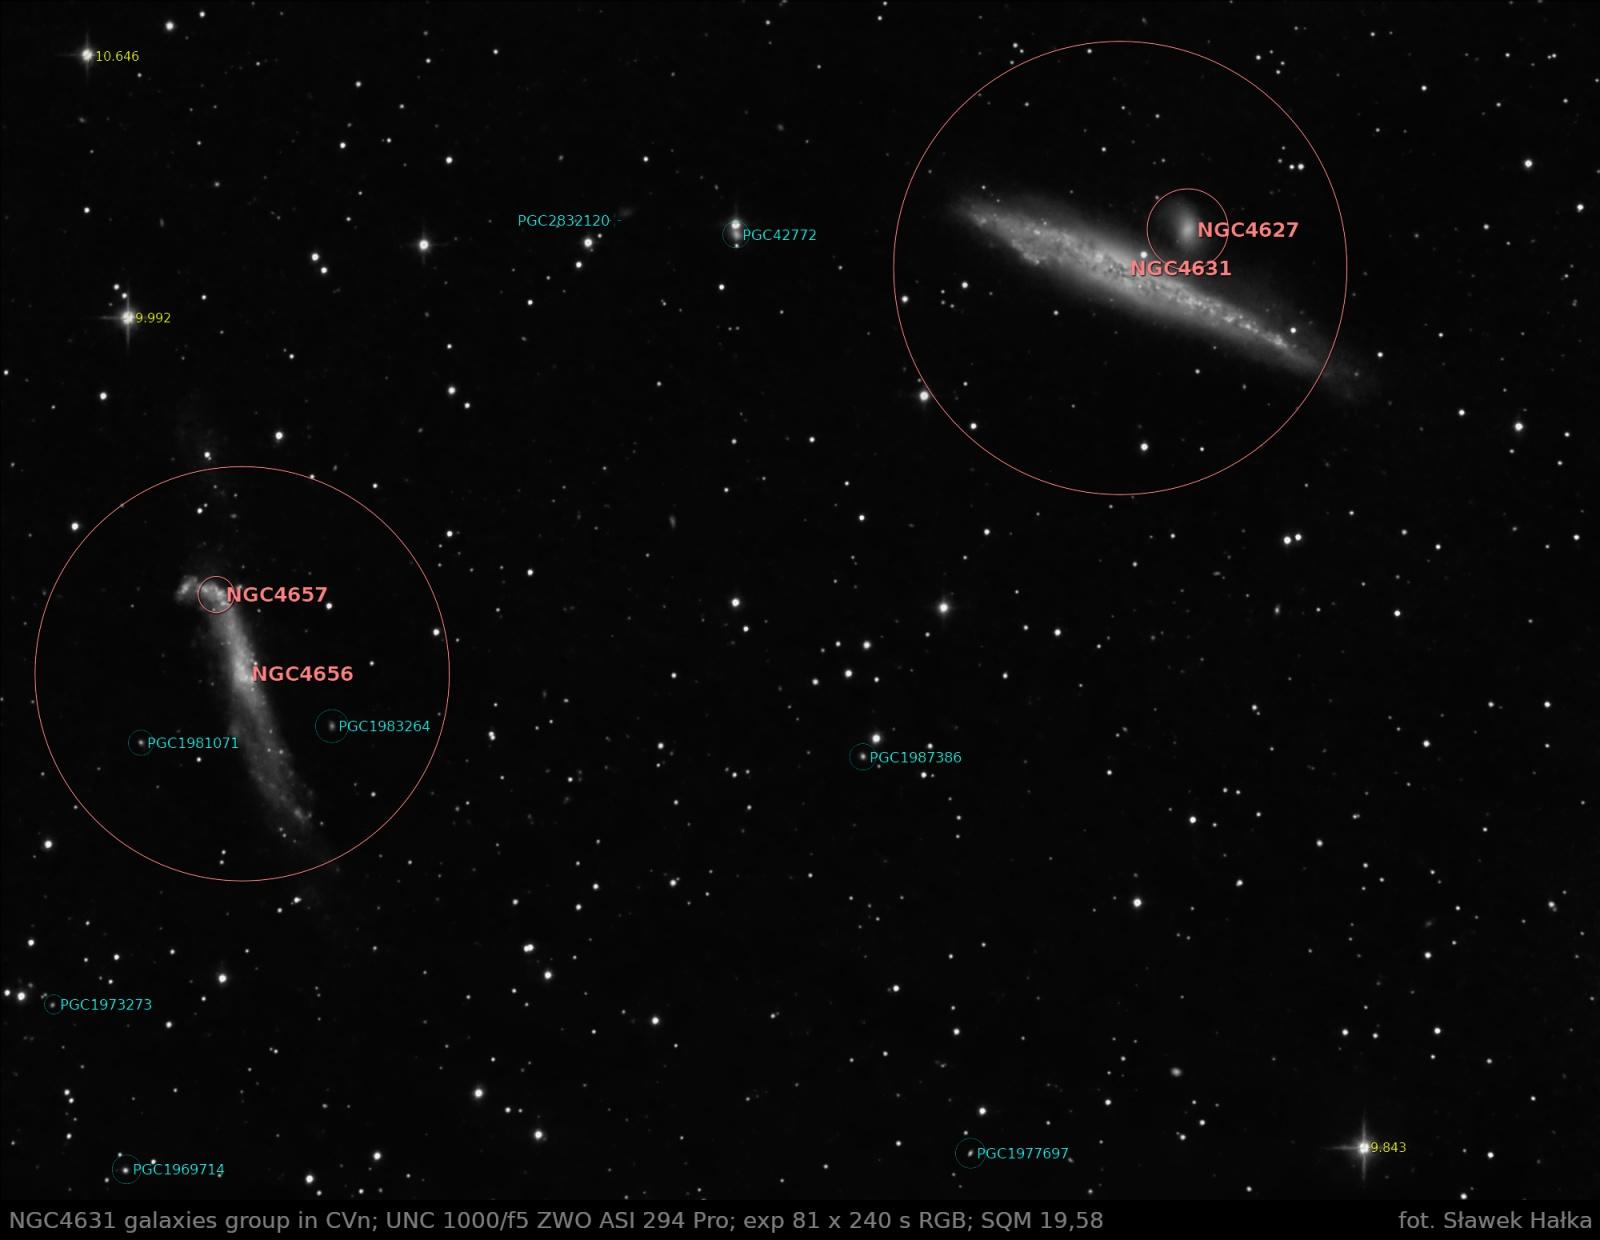 NGC4631_crop_3200_2400_DBE2_resize_2000_1500_grey_Annotated.thumb.jpg.04dbd7cbd8da8515d08c3f2a539c917c.jpg